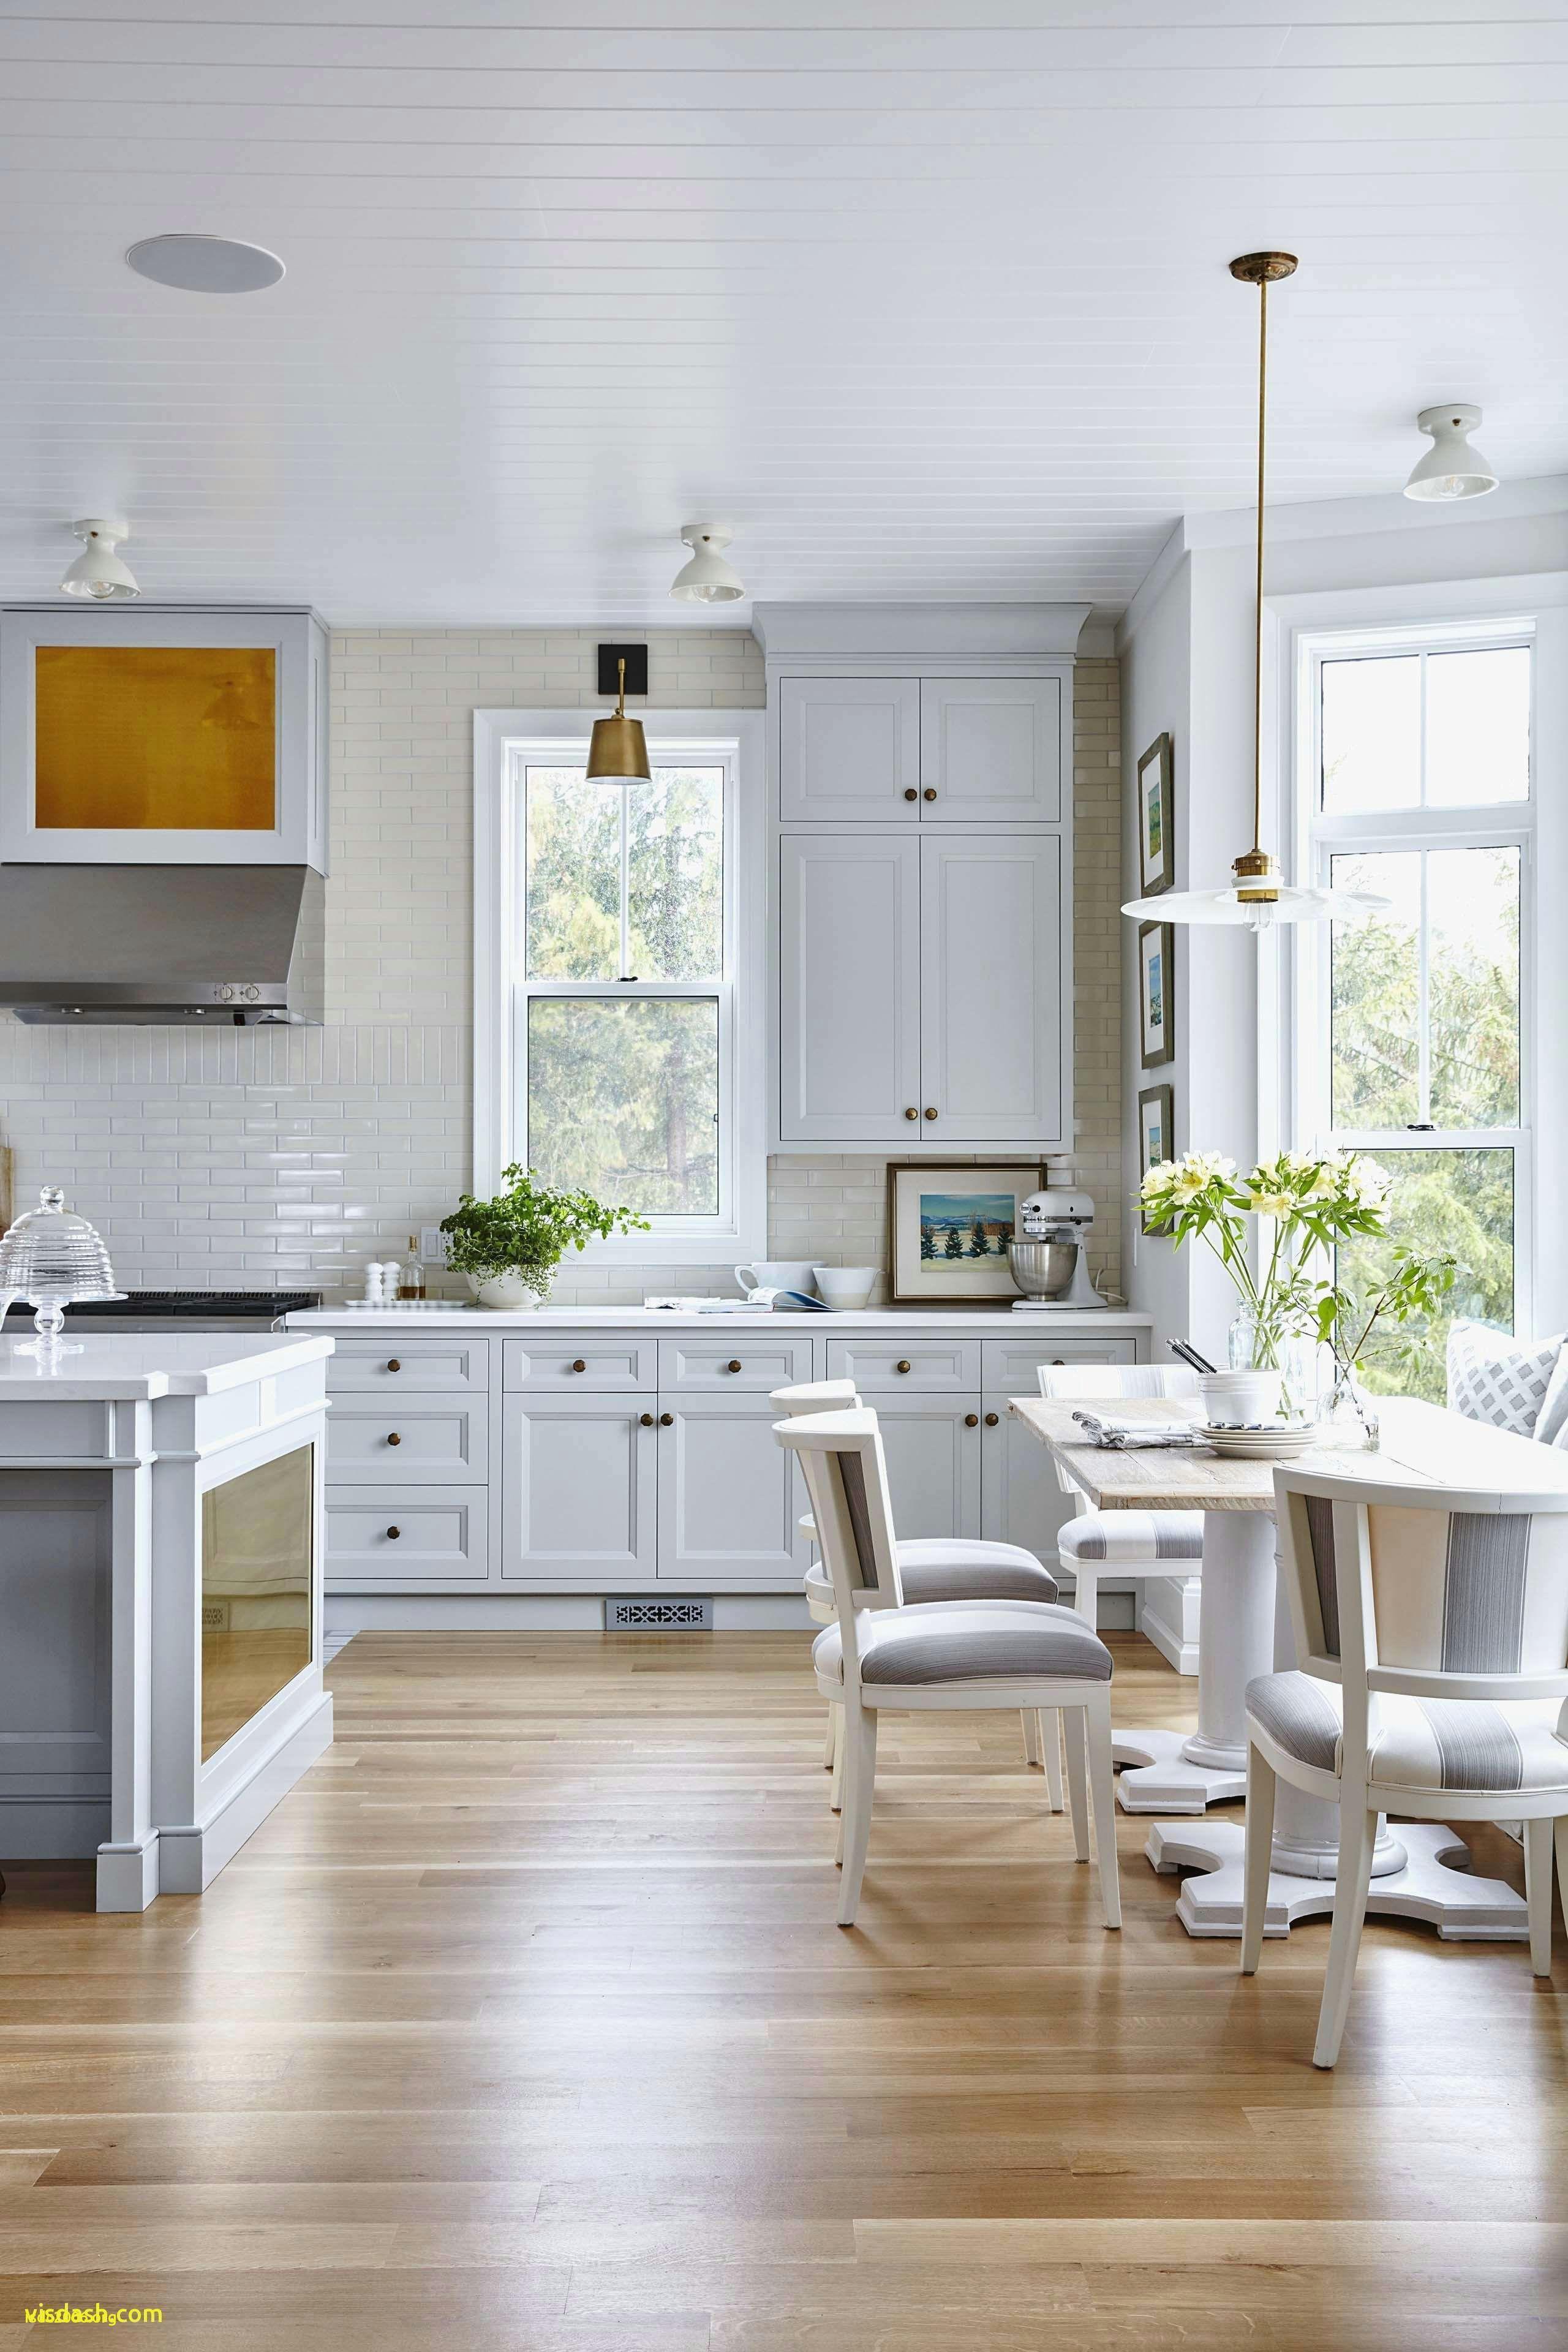 kitchen cary best kitchen joys kitchen joys kitchen 0d design ideas design ideas cute living